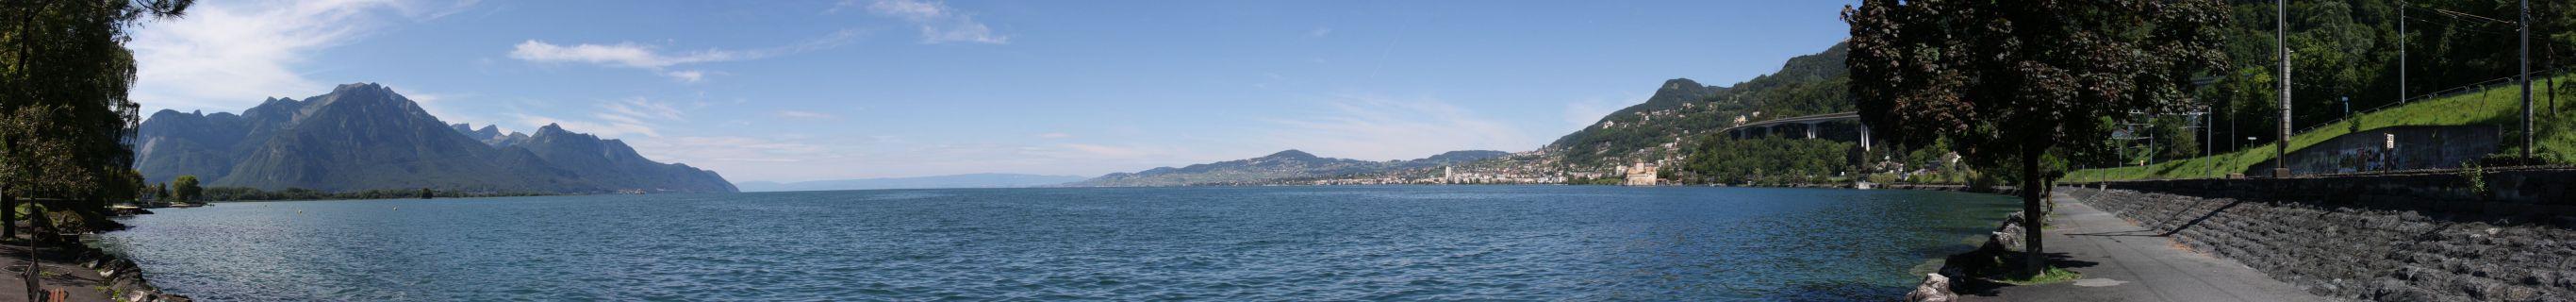 Montreux-Panorama von Villeneuve aus